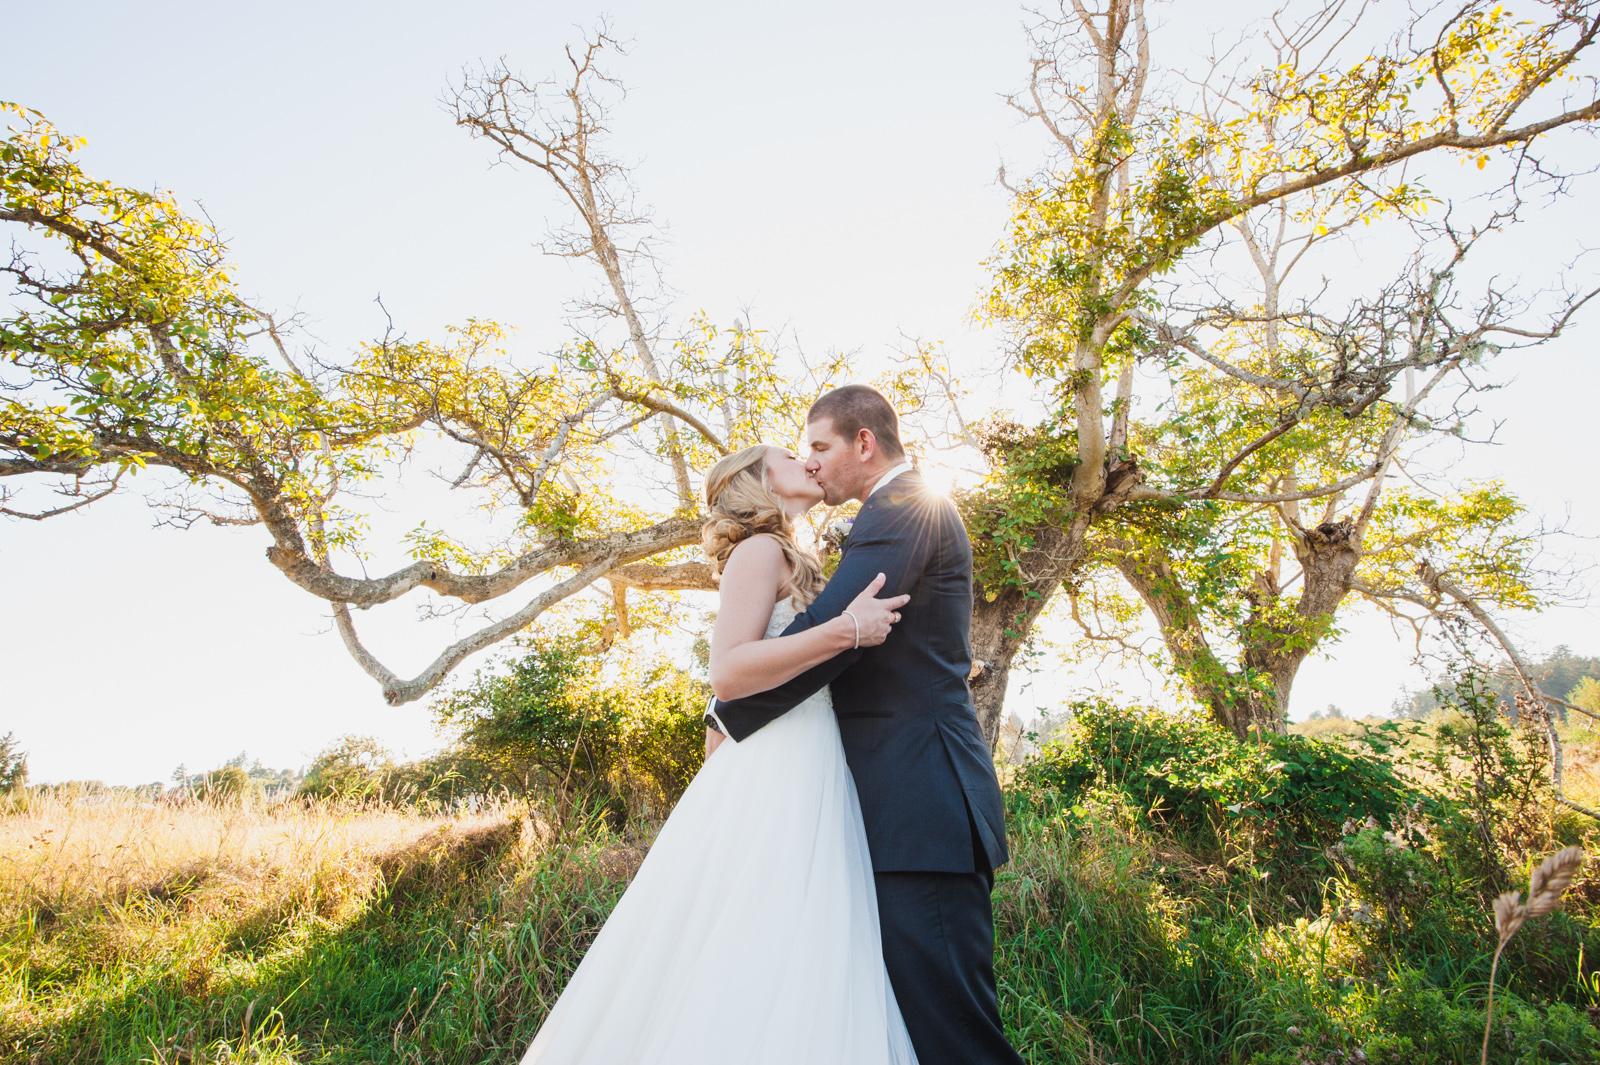 victoria-wedding-photographers-royal-colwood-golf-course-wedding-34.jpg